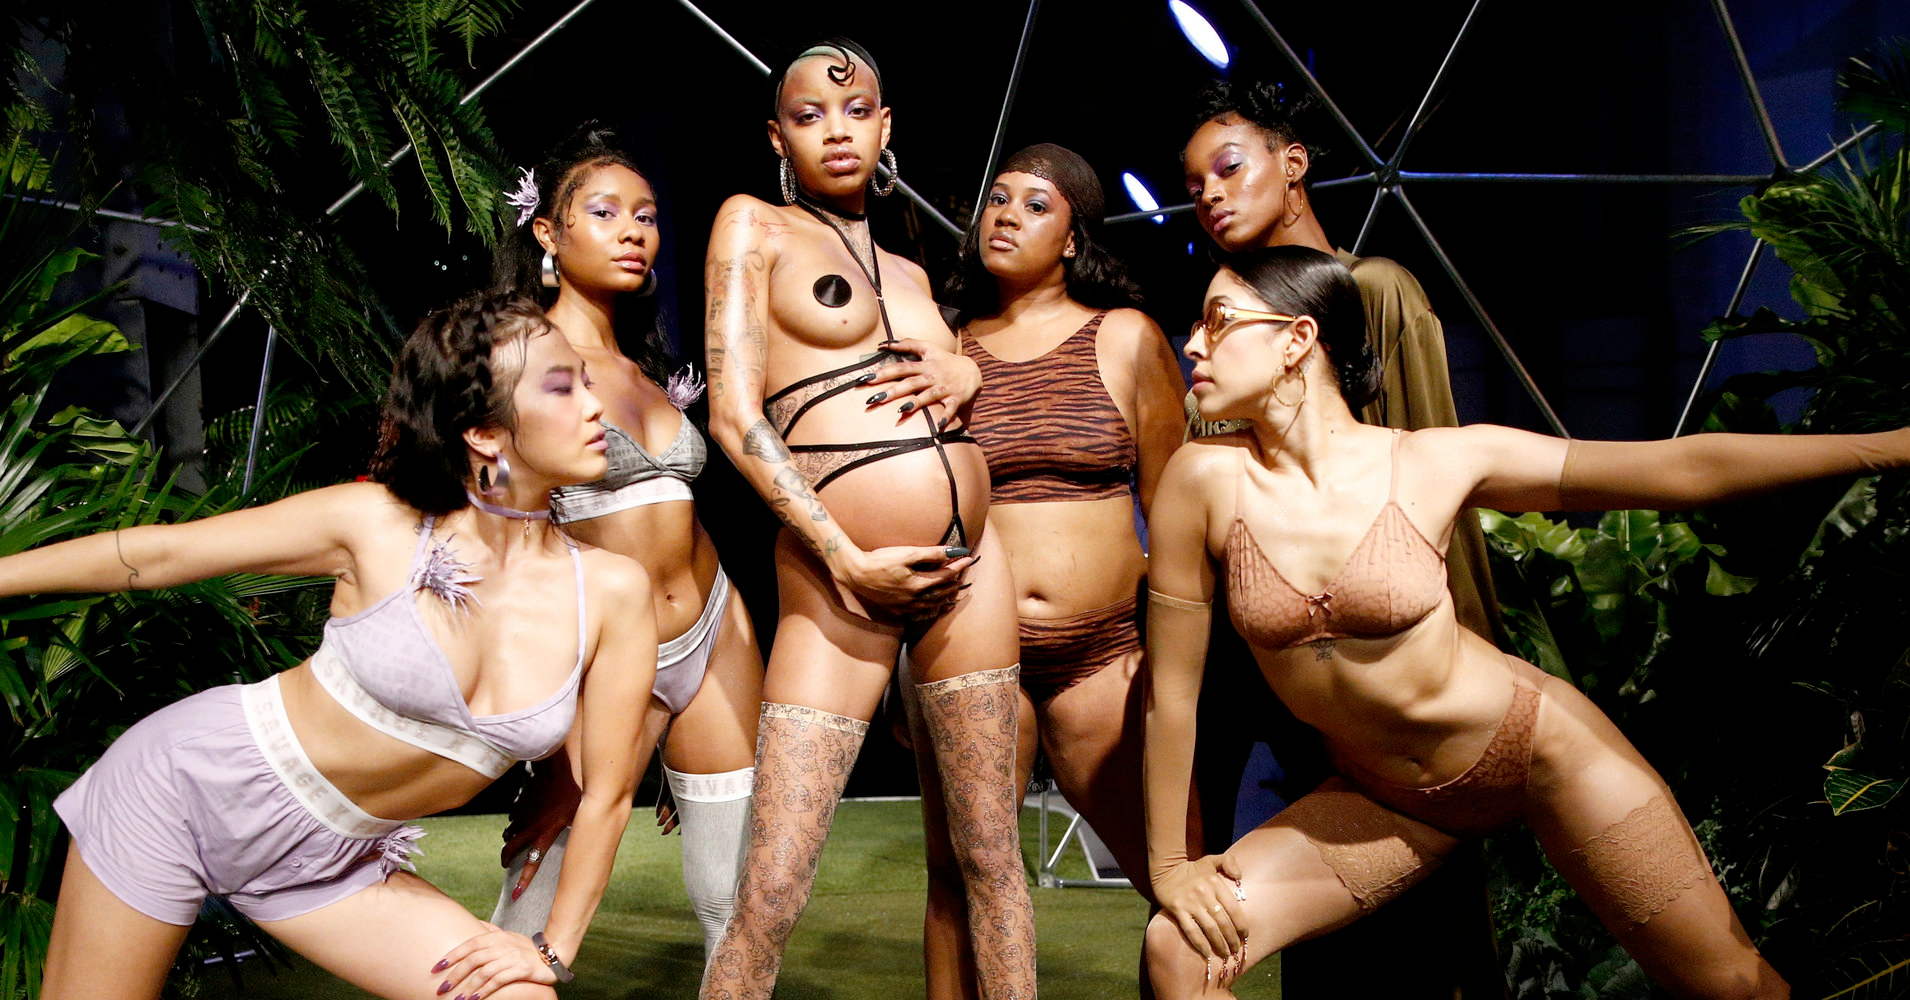 savage per fenty, intimo made by Rihanna